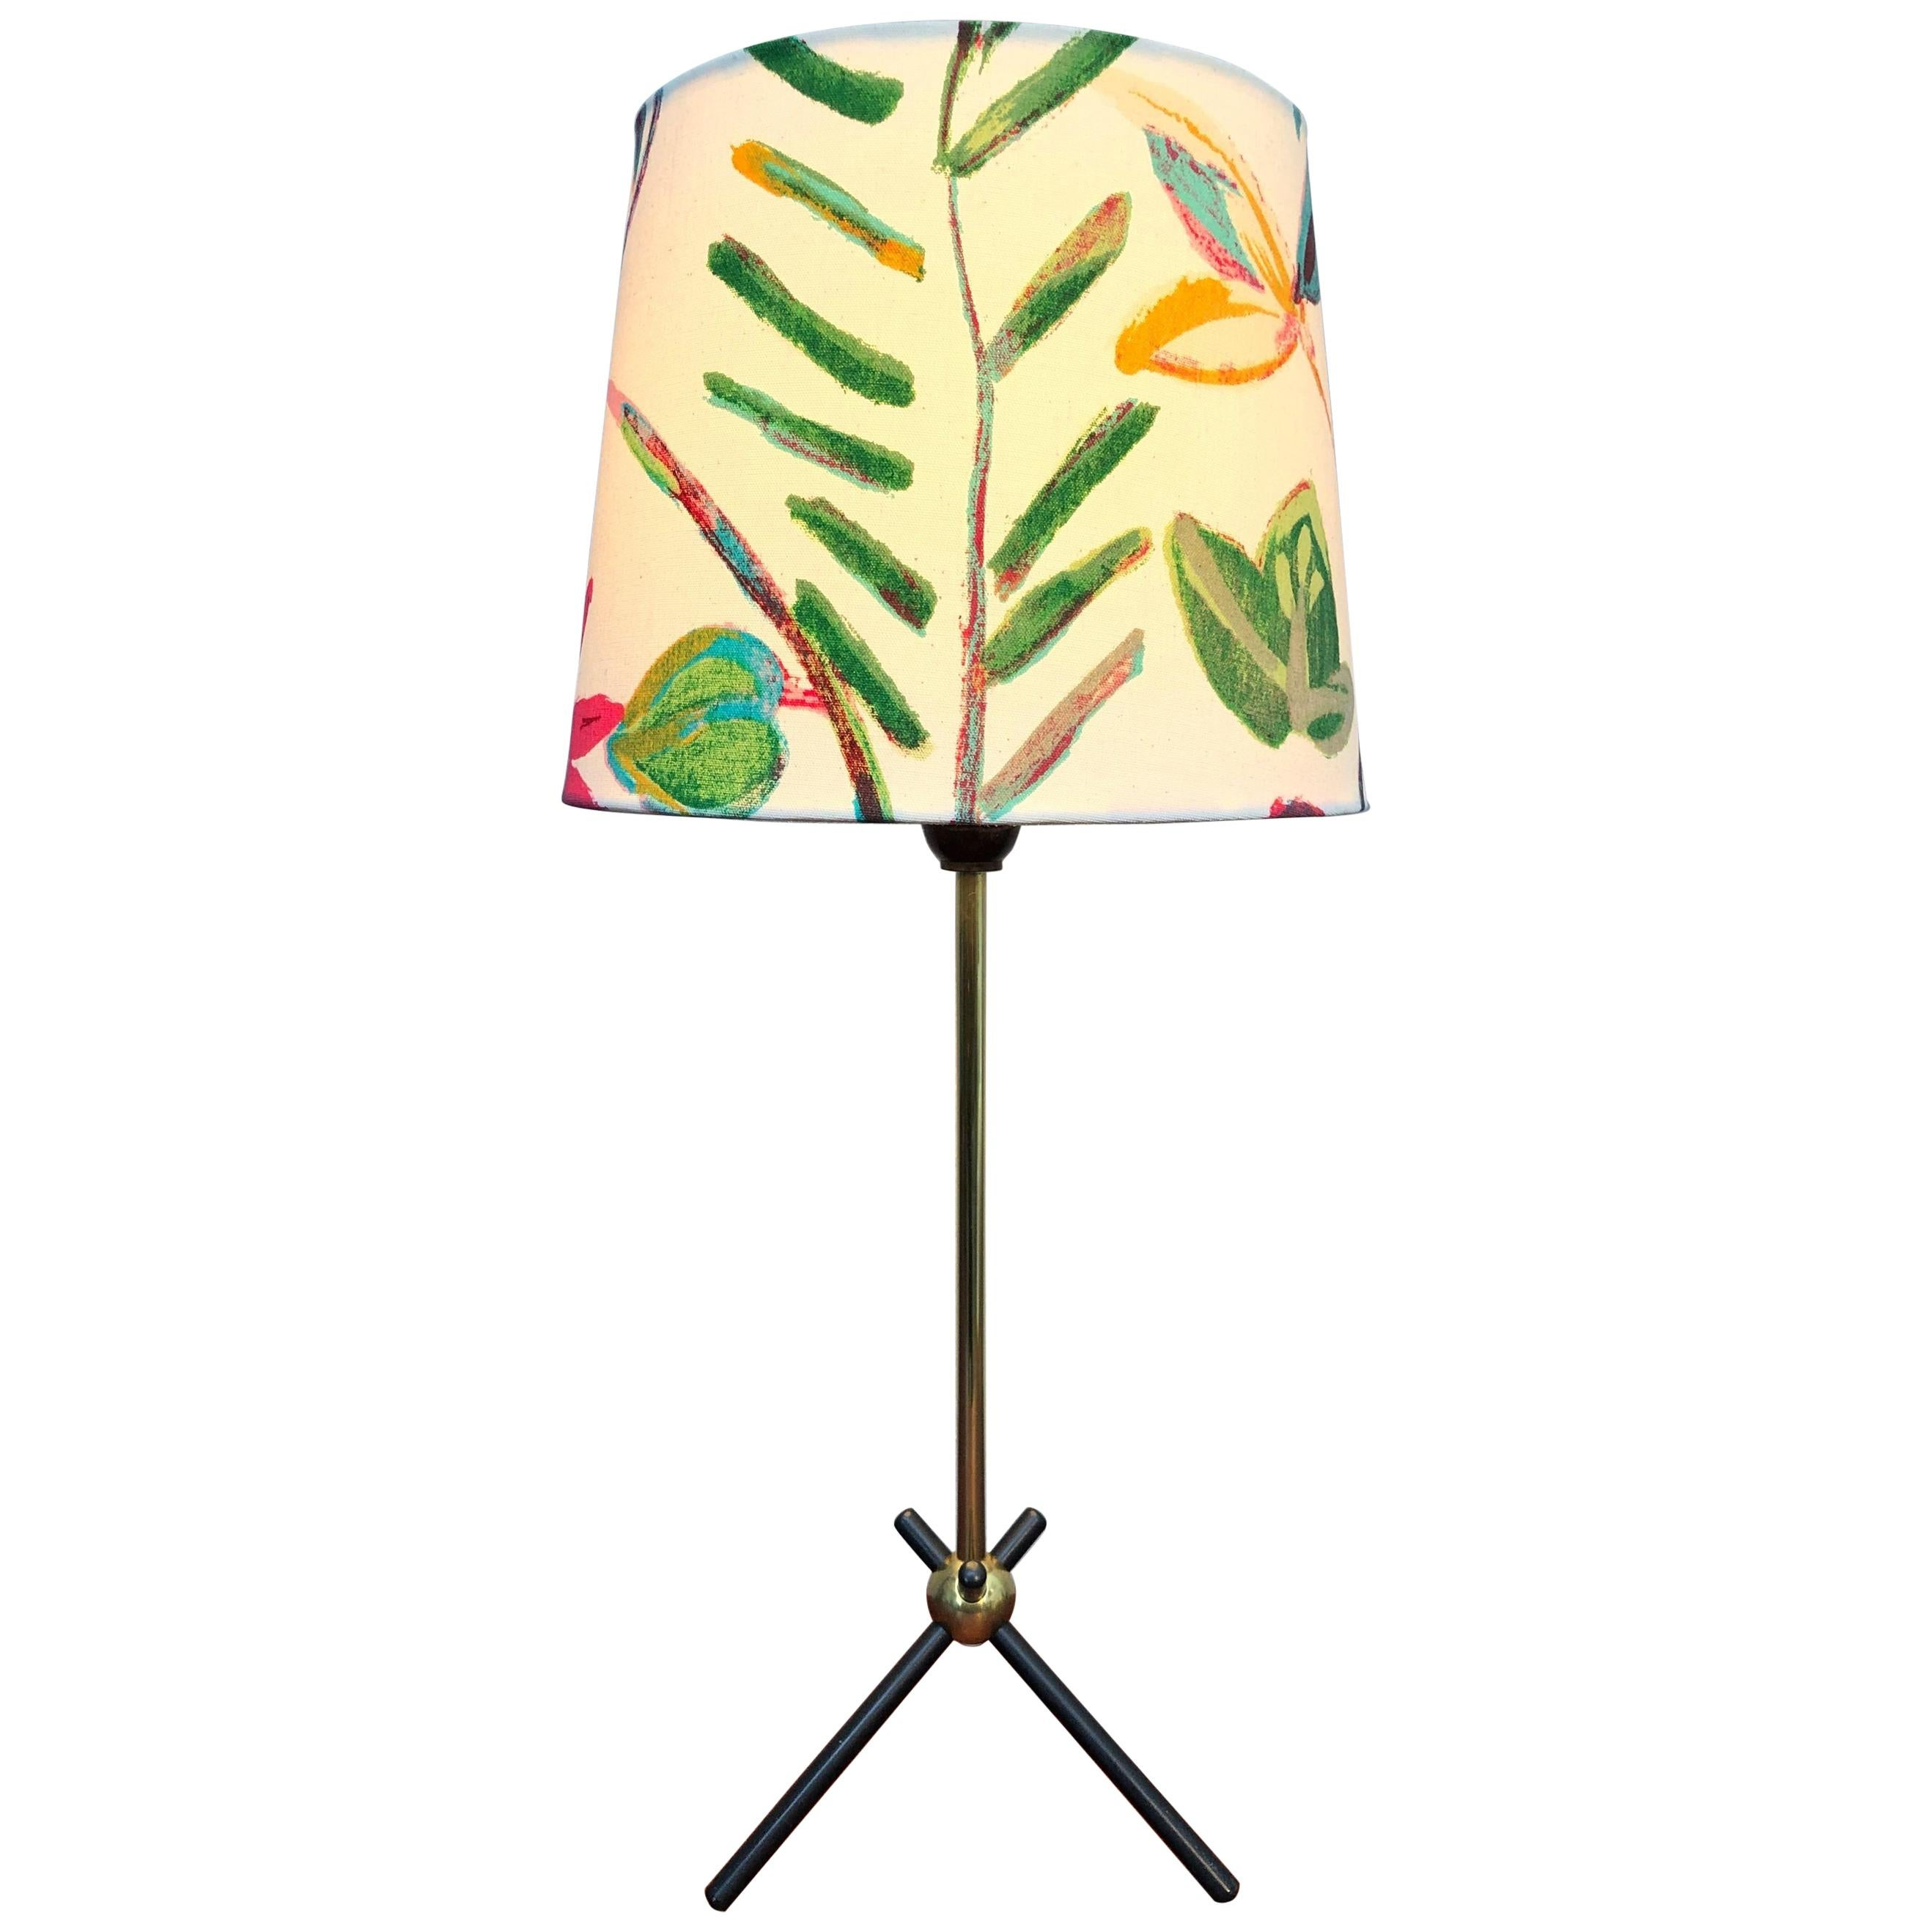 Stylish Mid-Century Modern Table Lamp in Brass